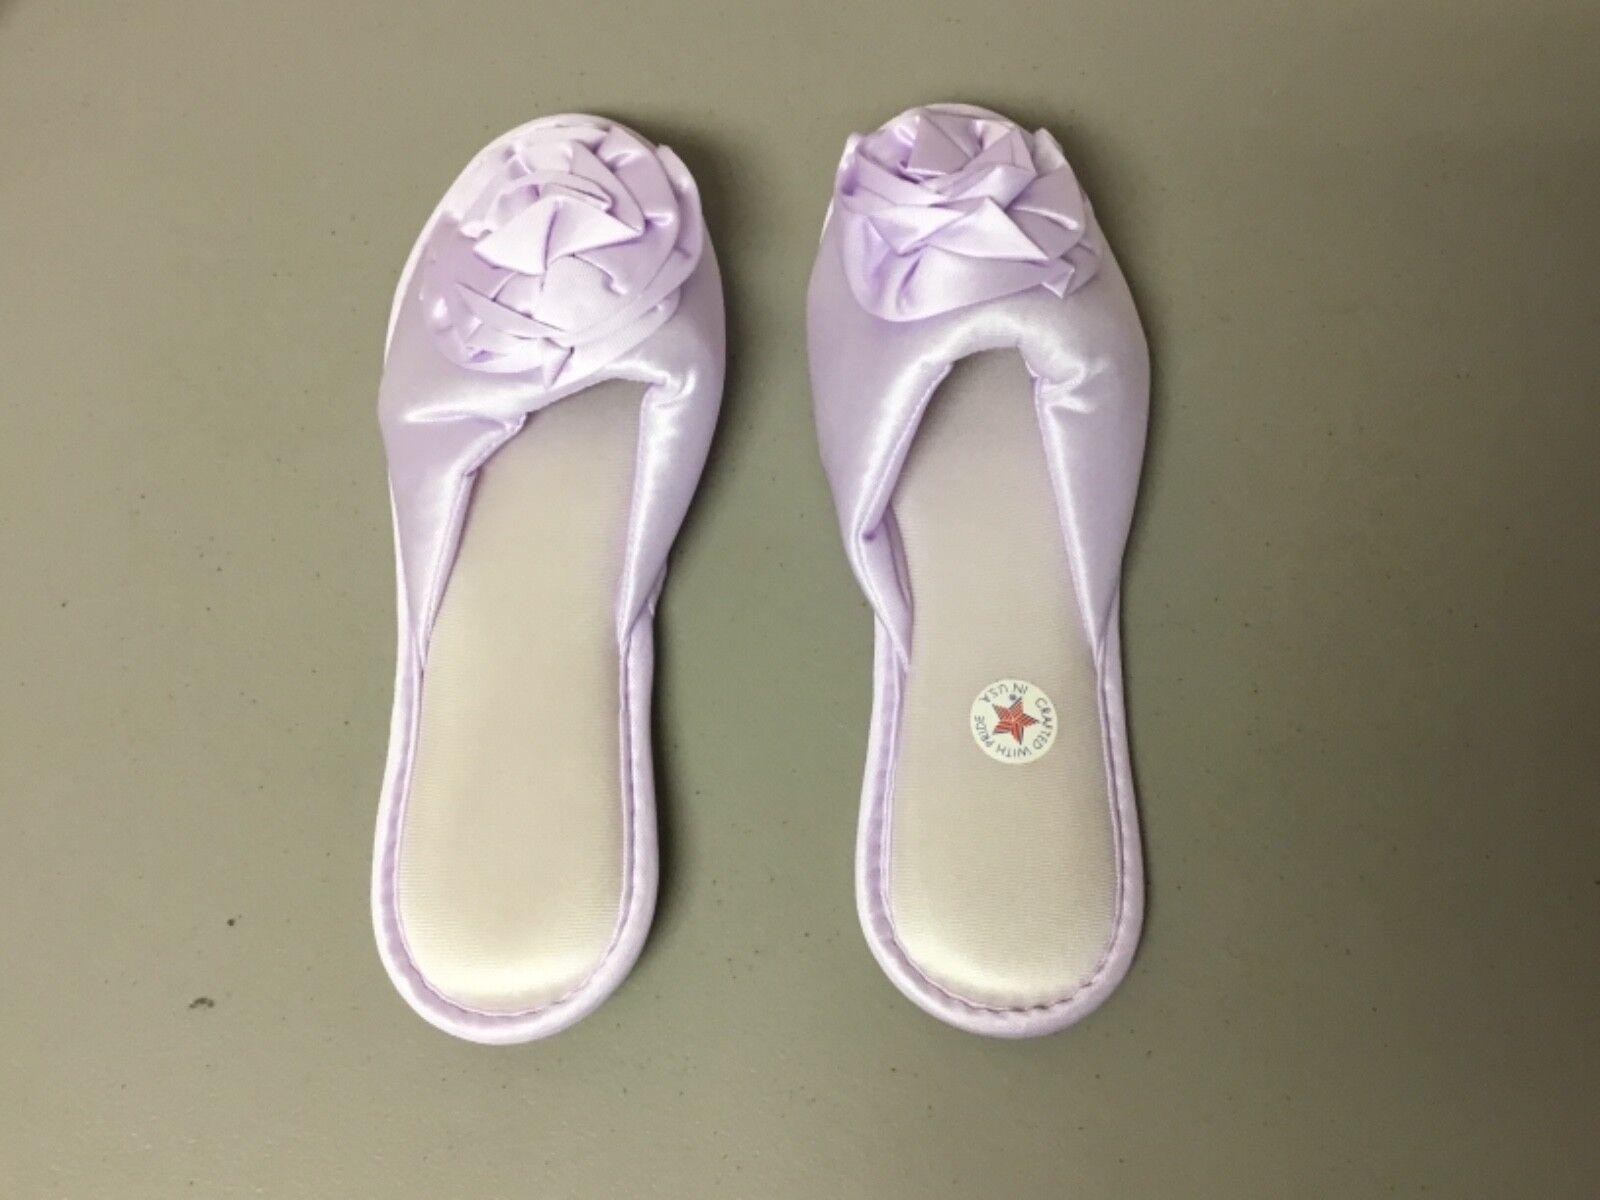 USA Nancy King Lingerie Washable Scuffs Bedroom Shoes XL 1 Pair Lilac #284L